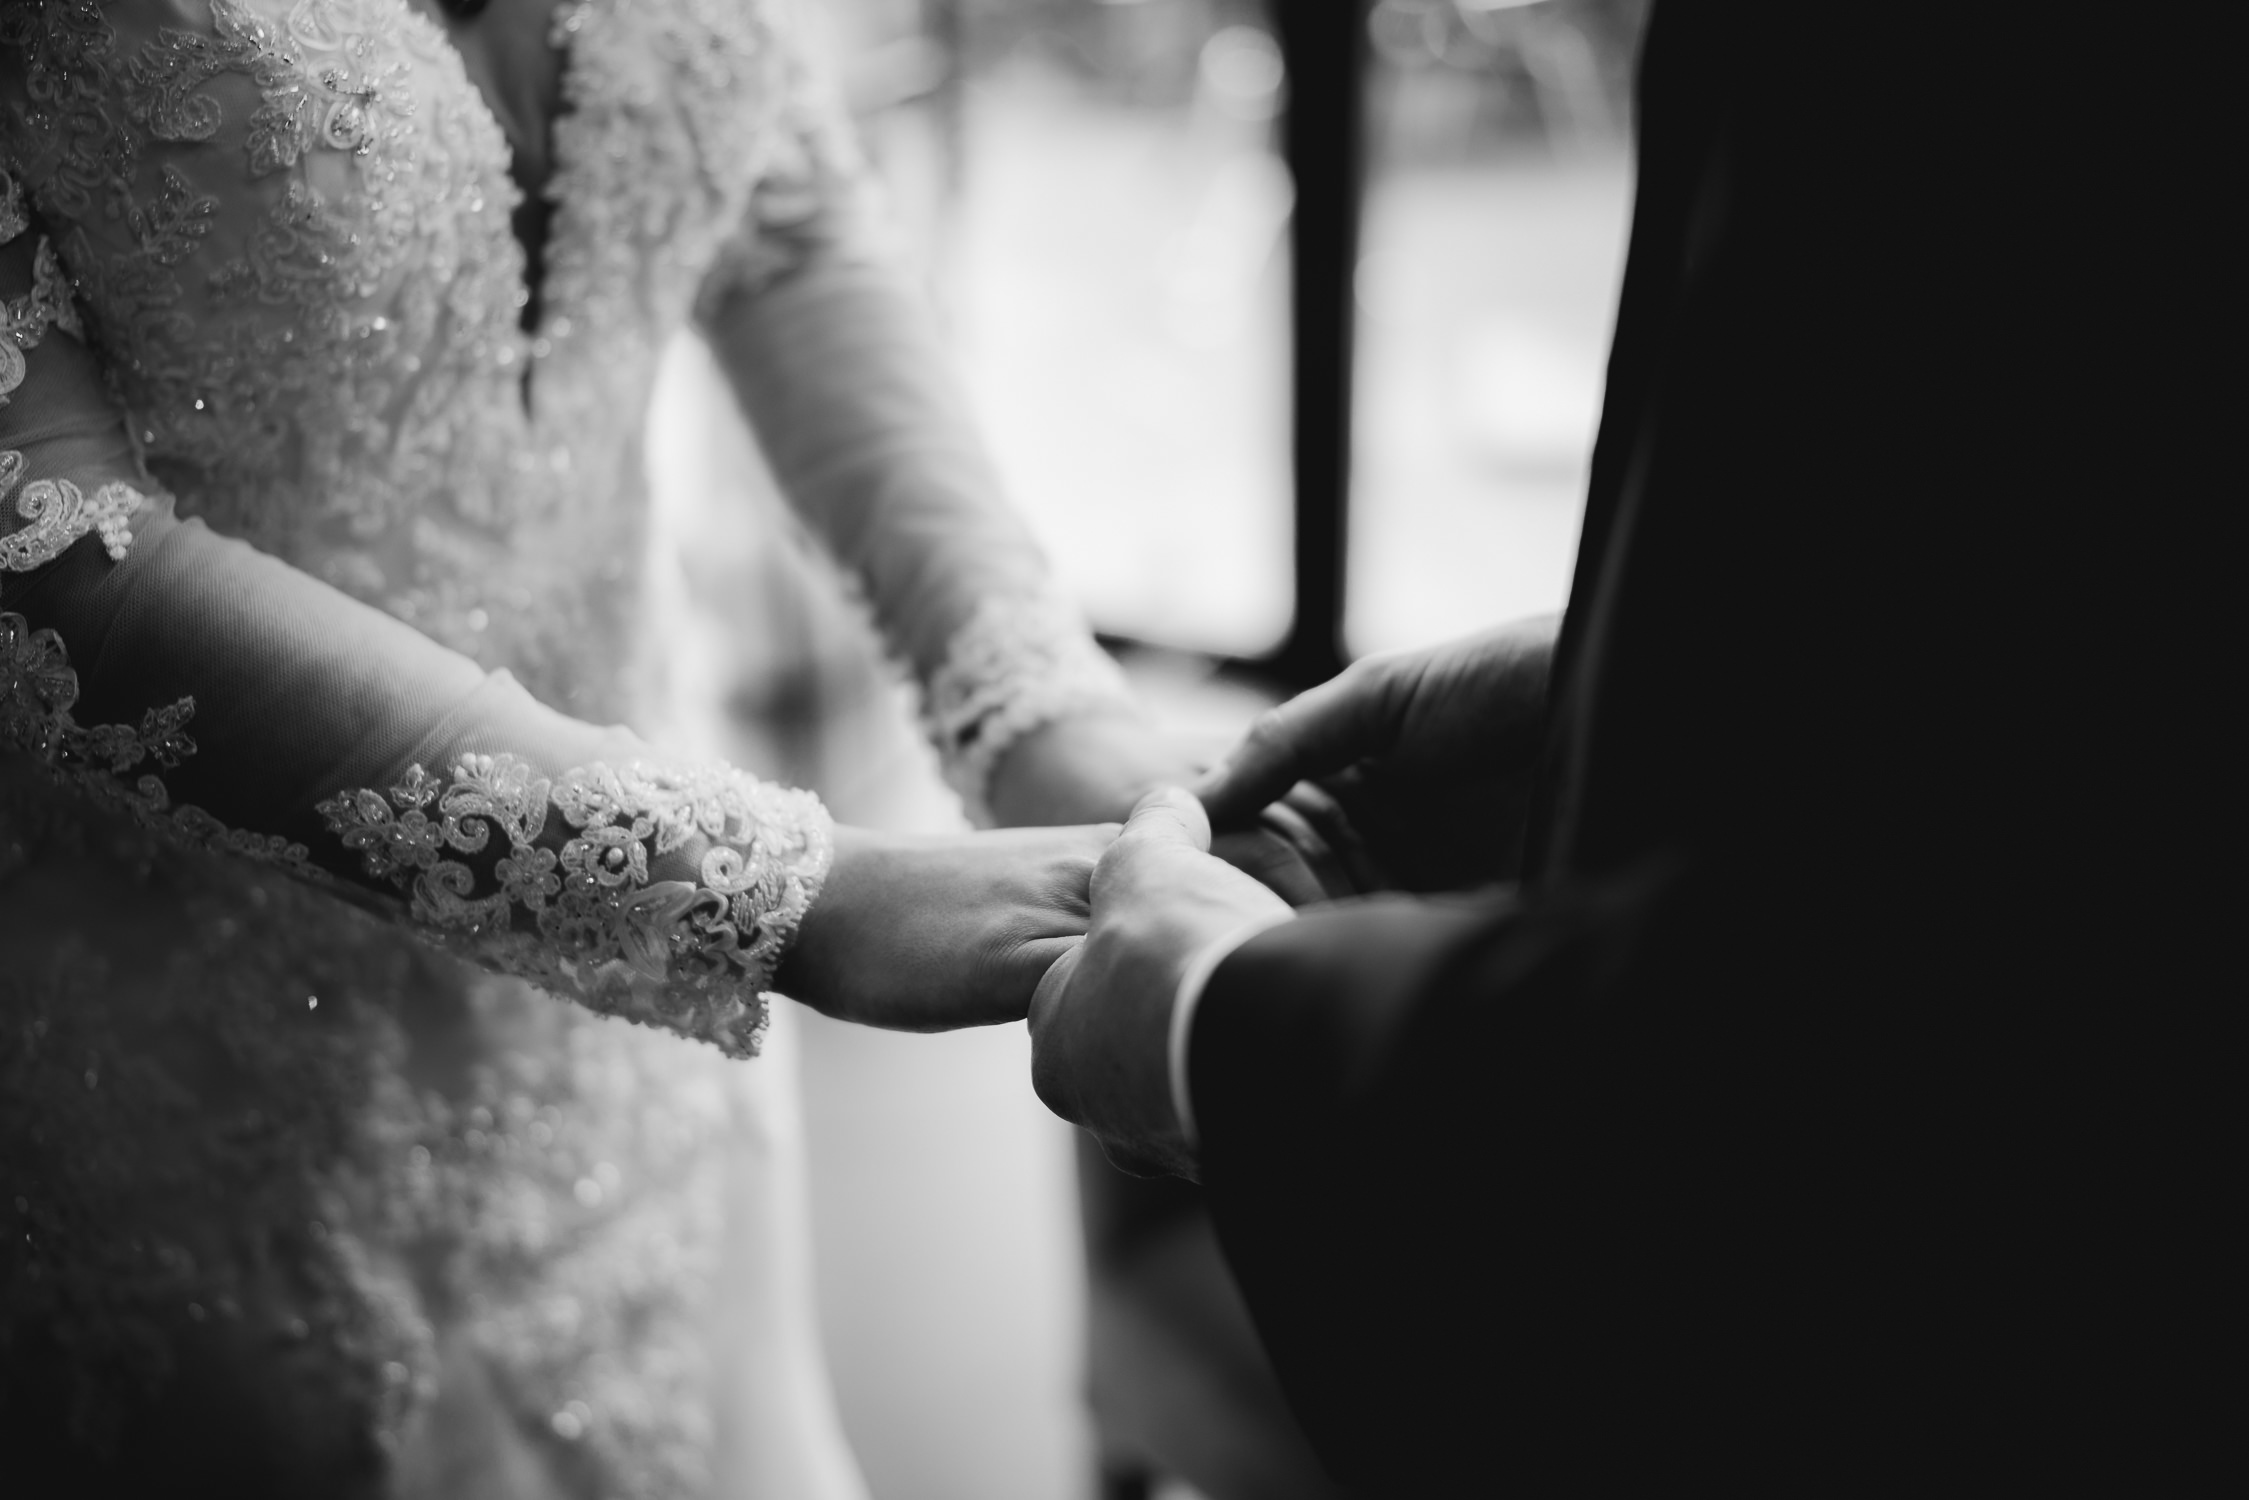 bruidsfotografie-amsterdam-utrecht-trouwfotograaf-mark-hadden-wedding-photography-Robin & Guus-218-2.jpg